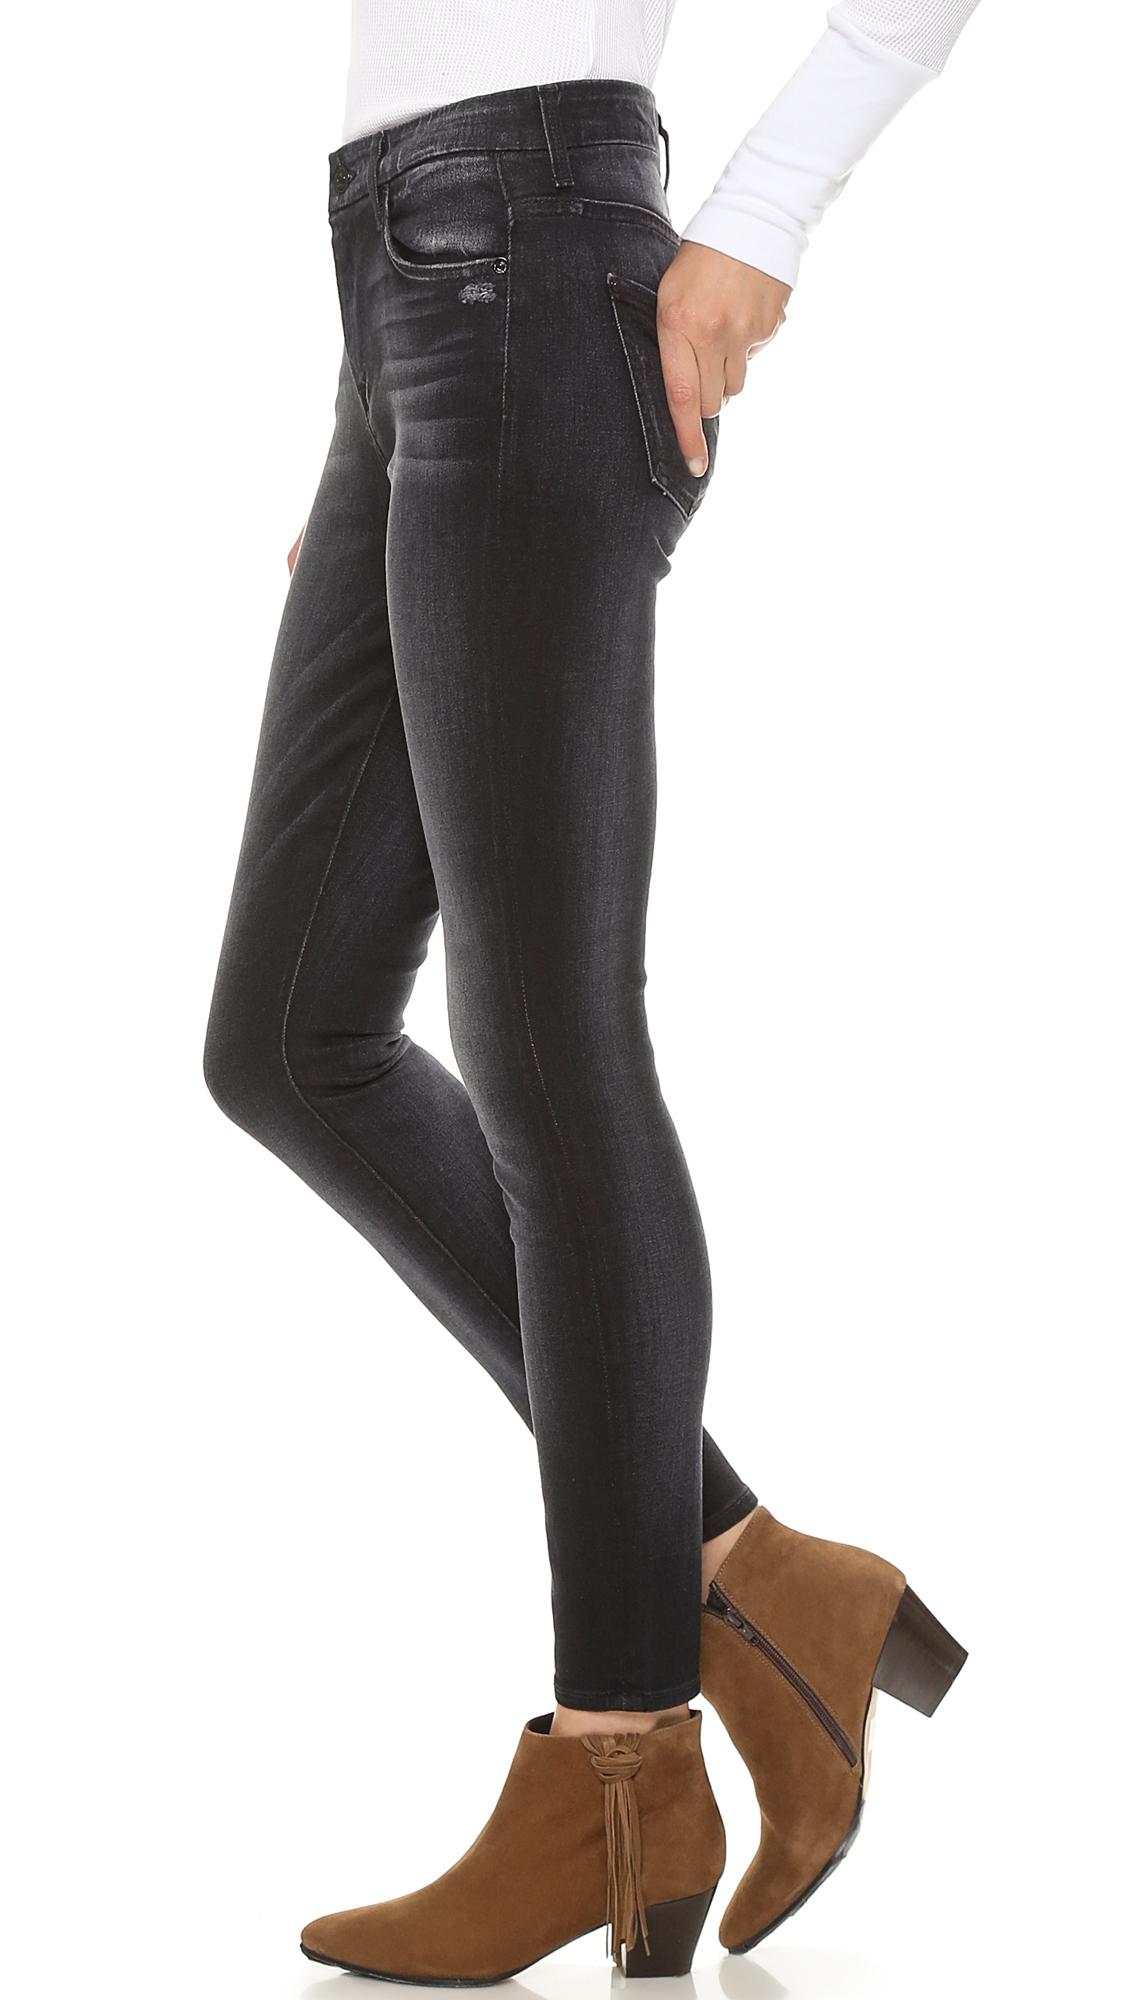 7 for all mankind High Waist Slim Illusion Skinny Jeans - Slim ...